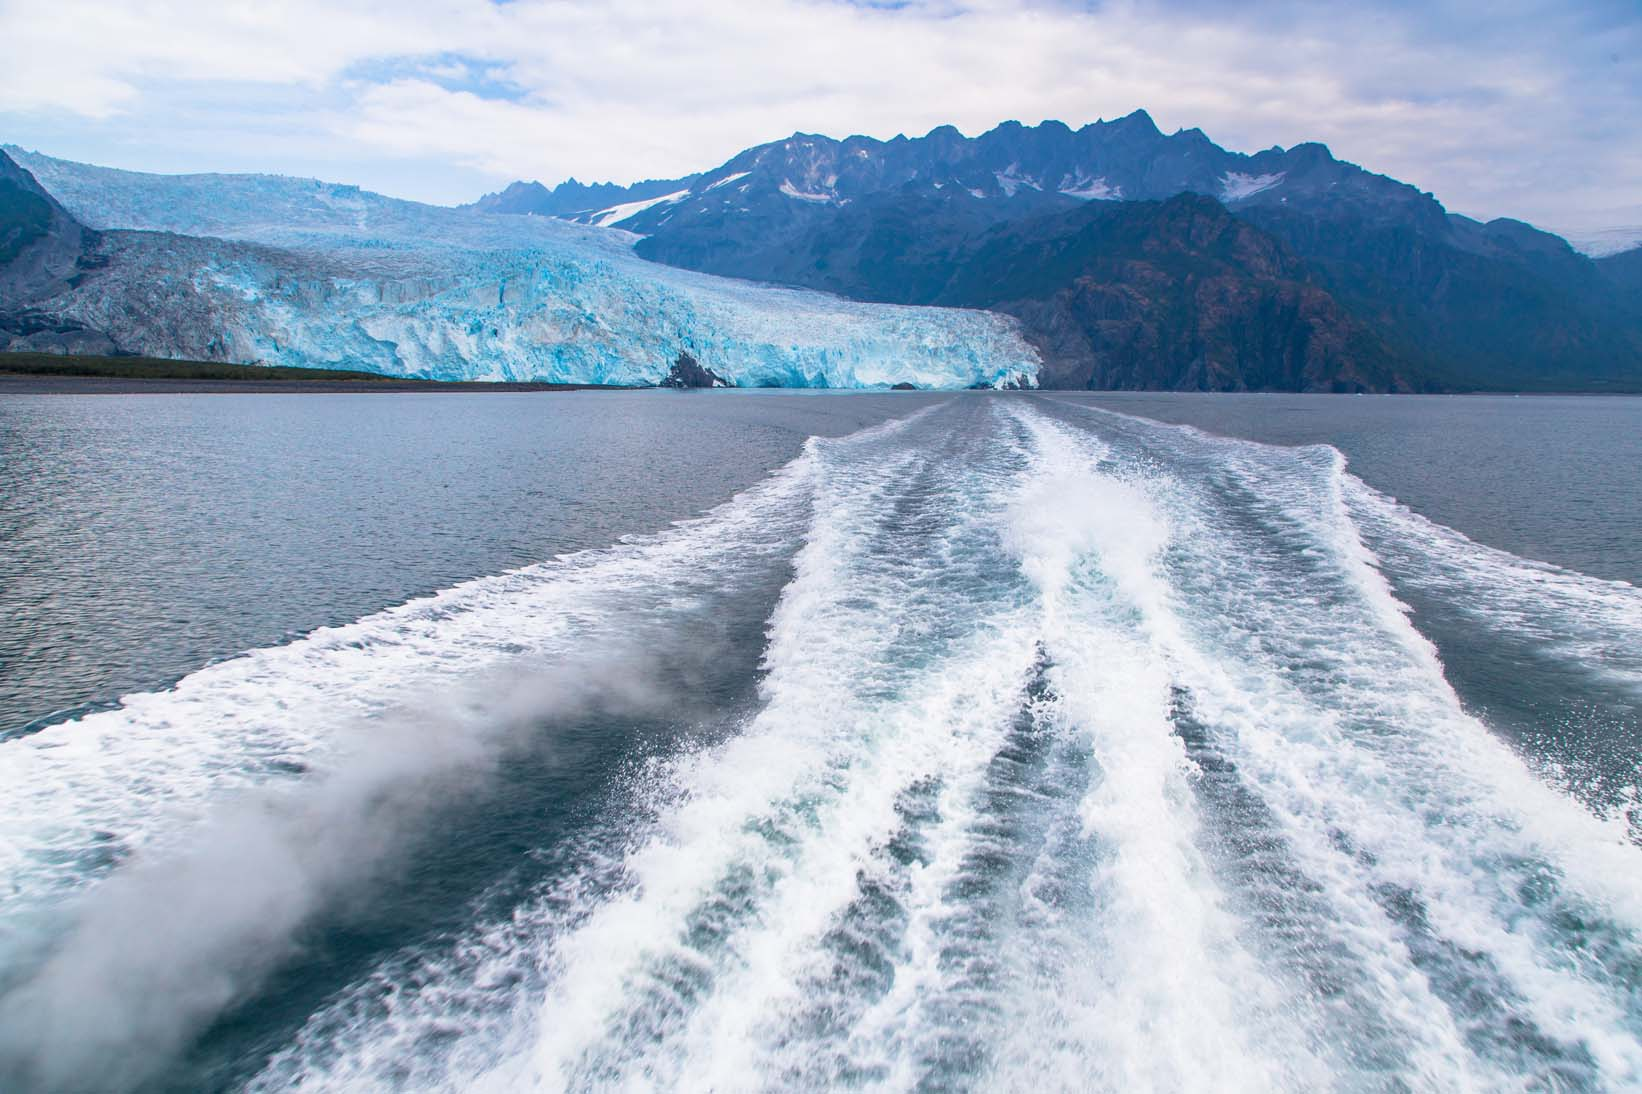 Alaska Day 16: Kenai Fjords National Park Tour